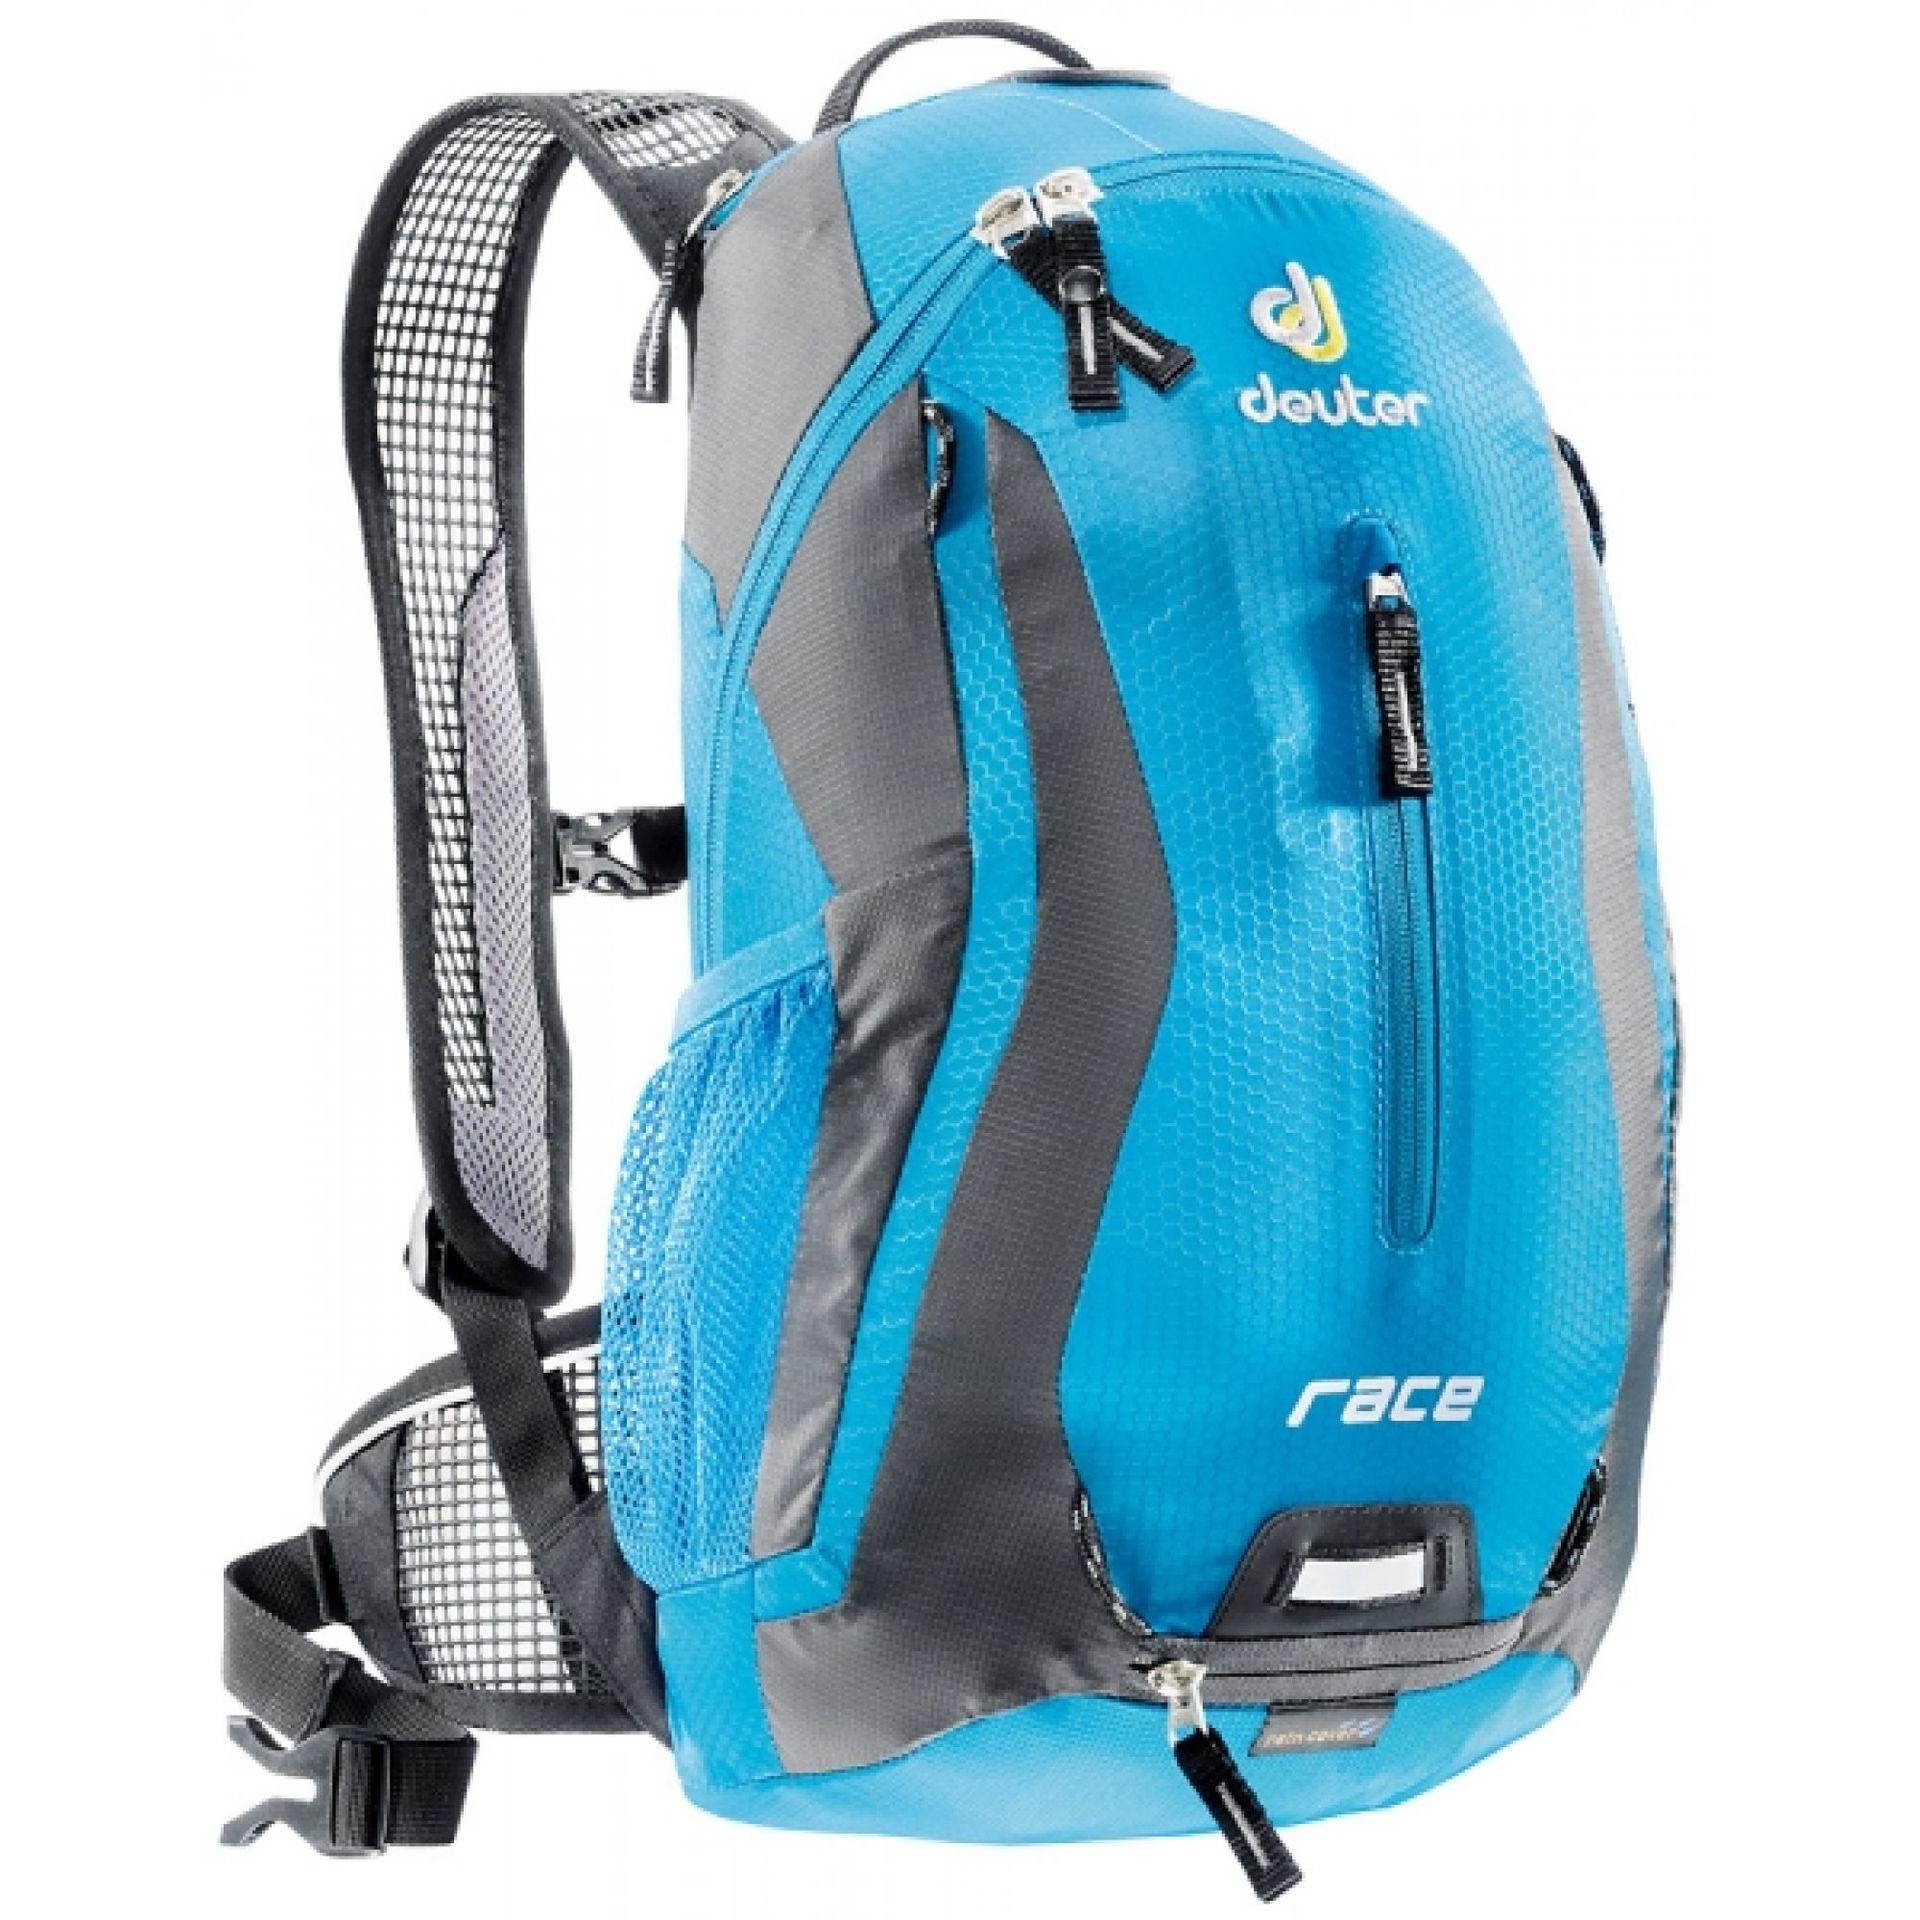 Plecak Deuter Race niebiesko szary